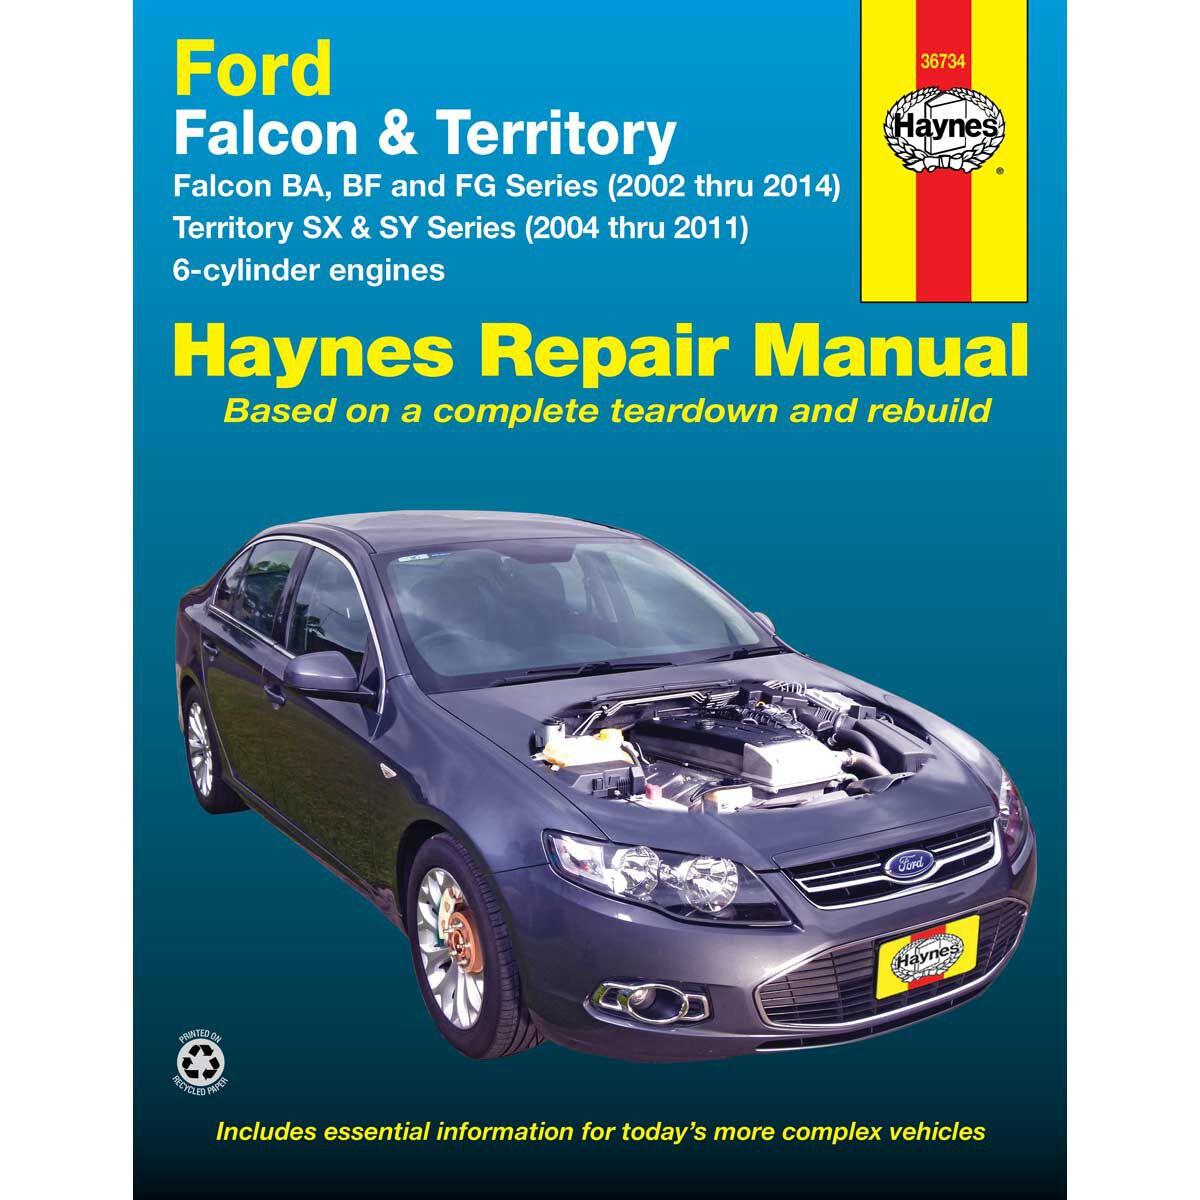 haynes car manual for ford falcon territory 2002 2014 36734 rh supercheapauto com au